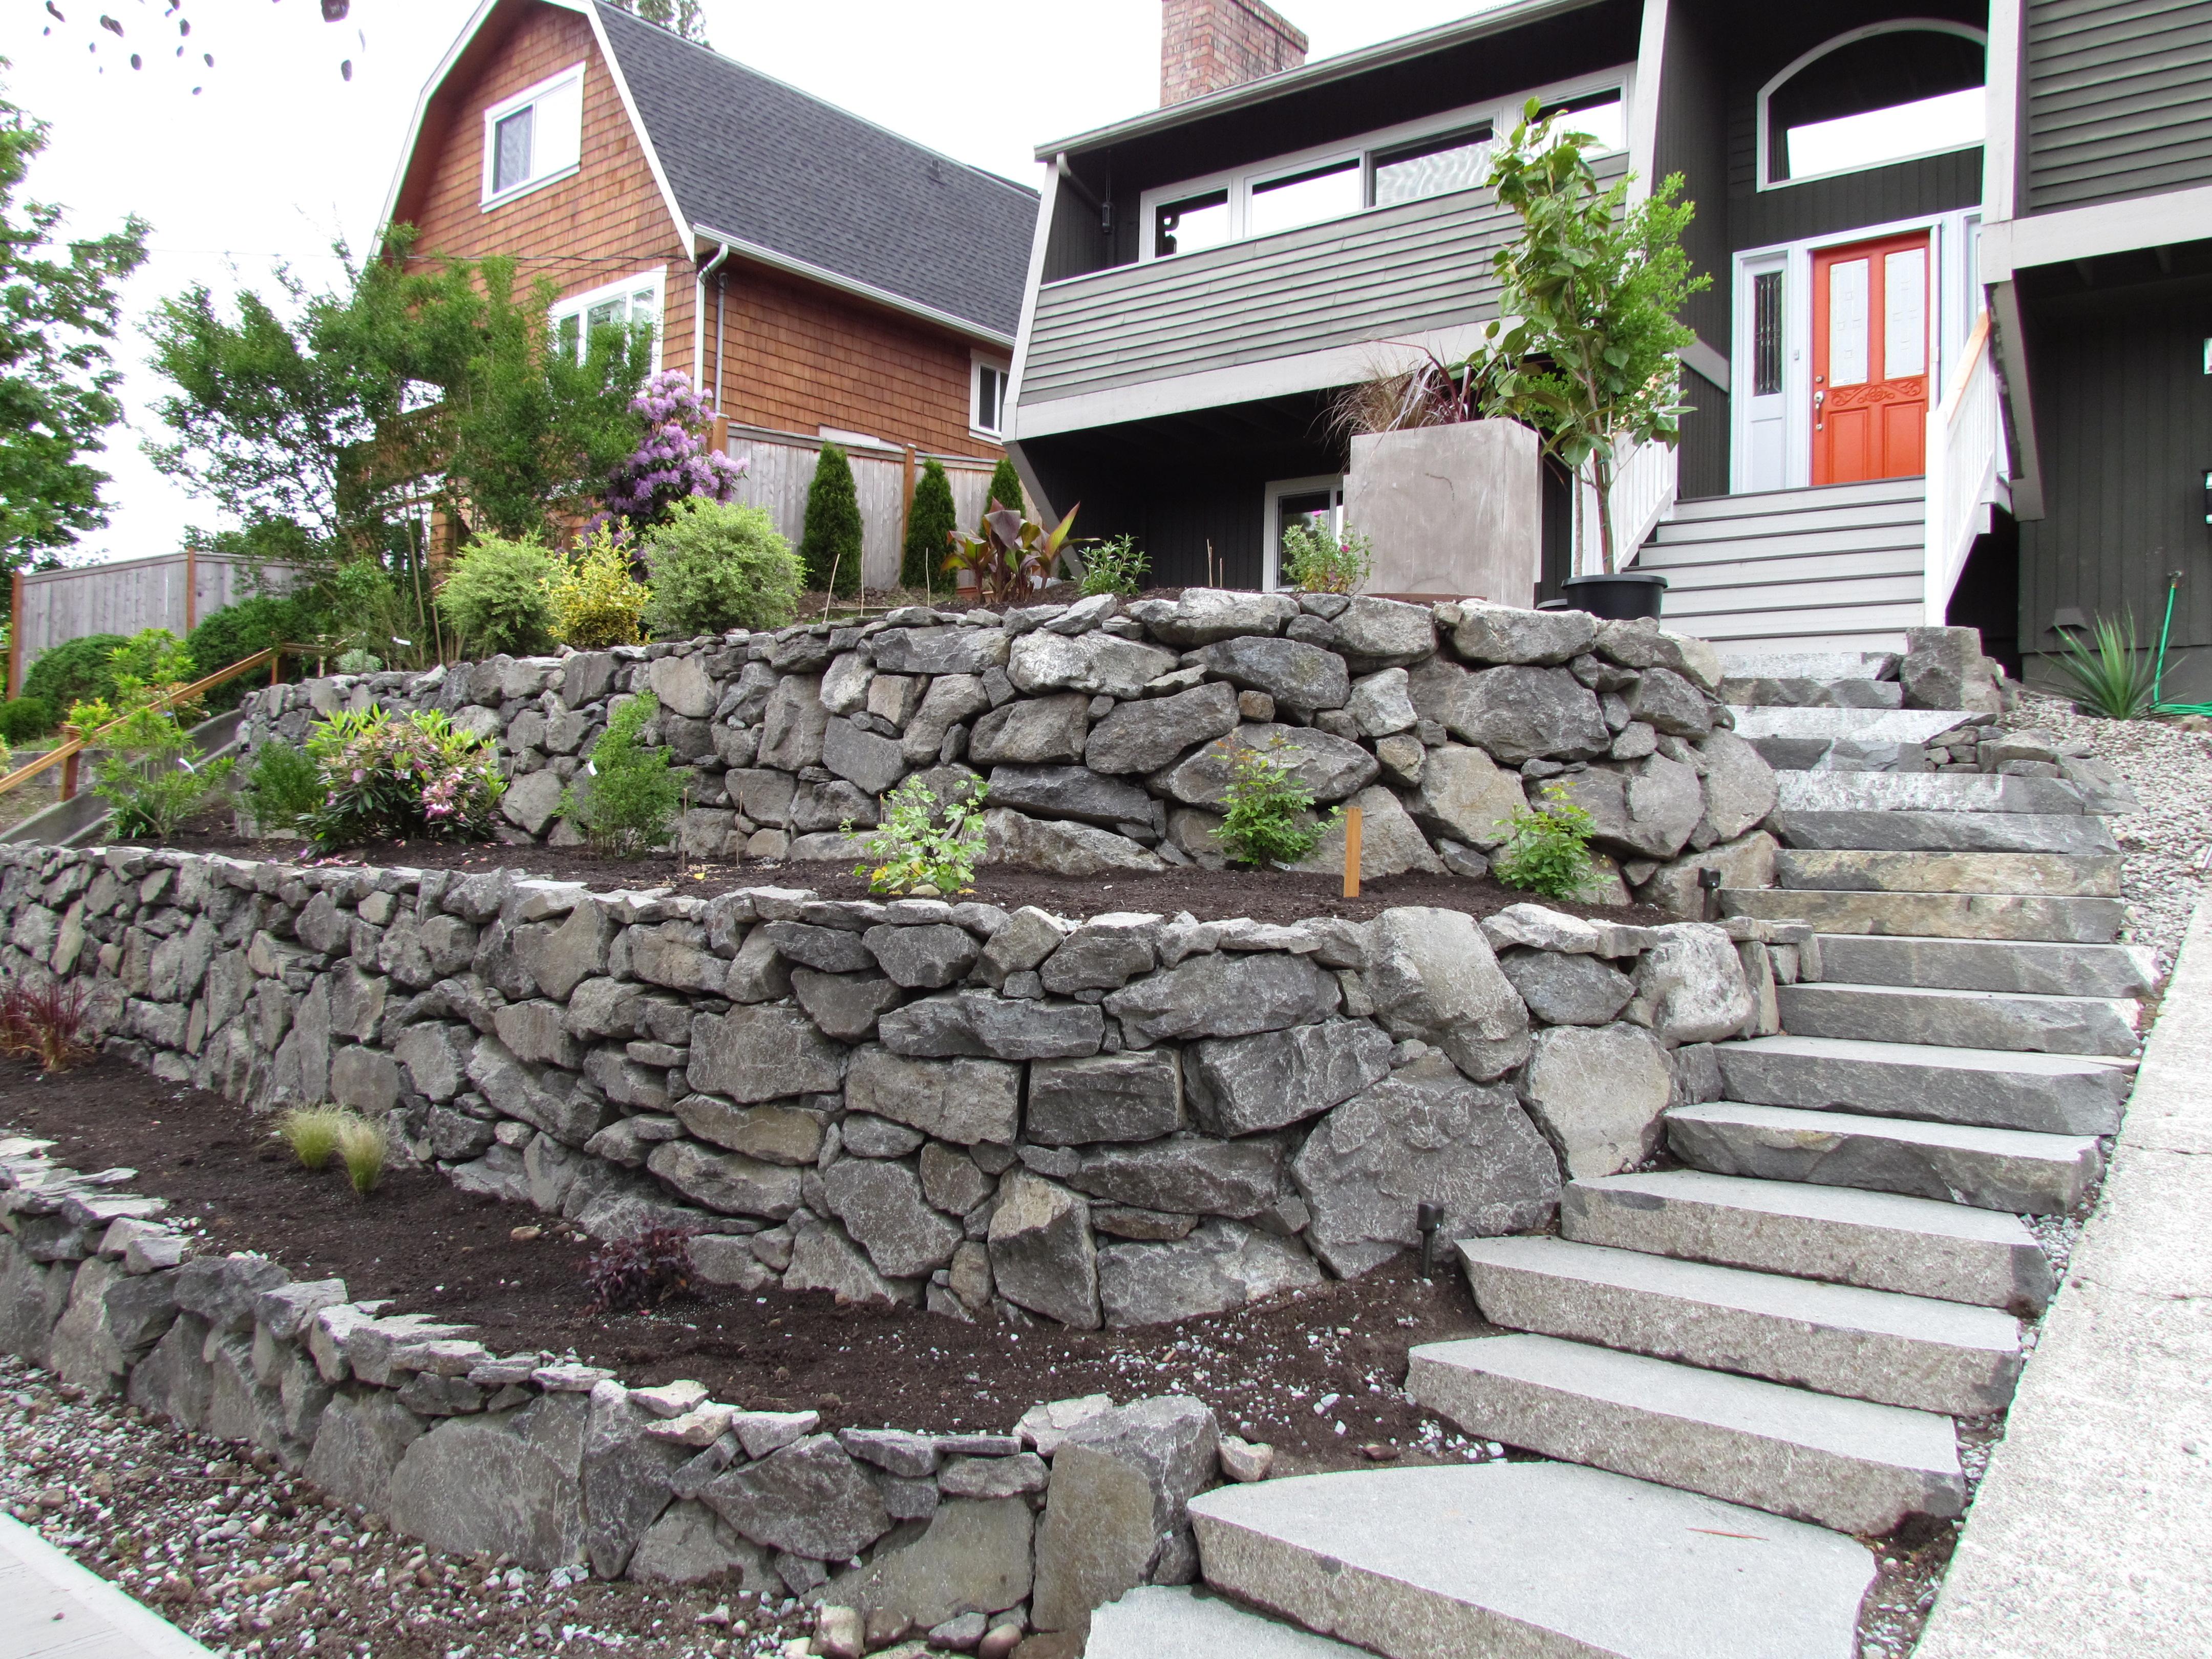 Rockery garden